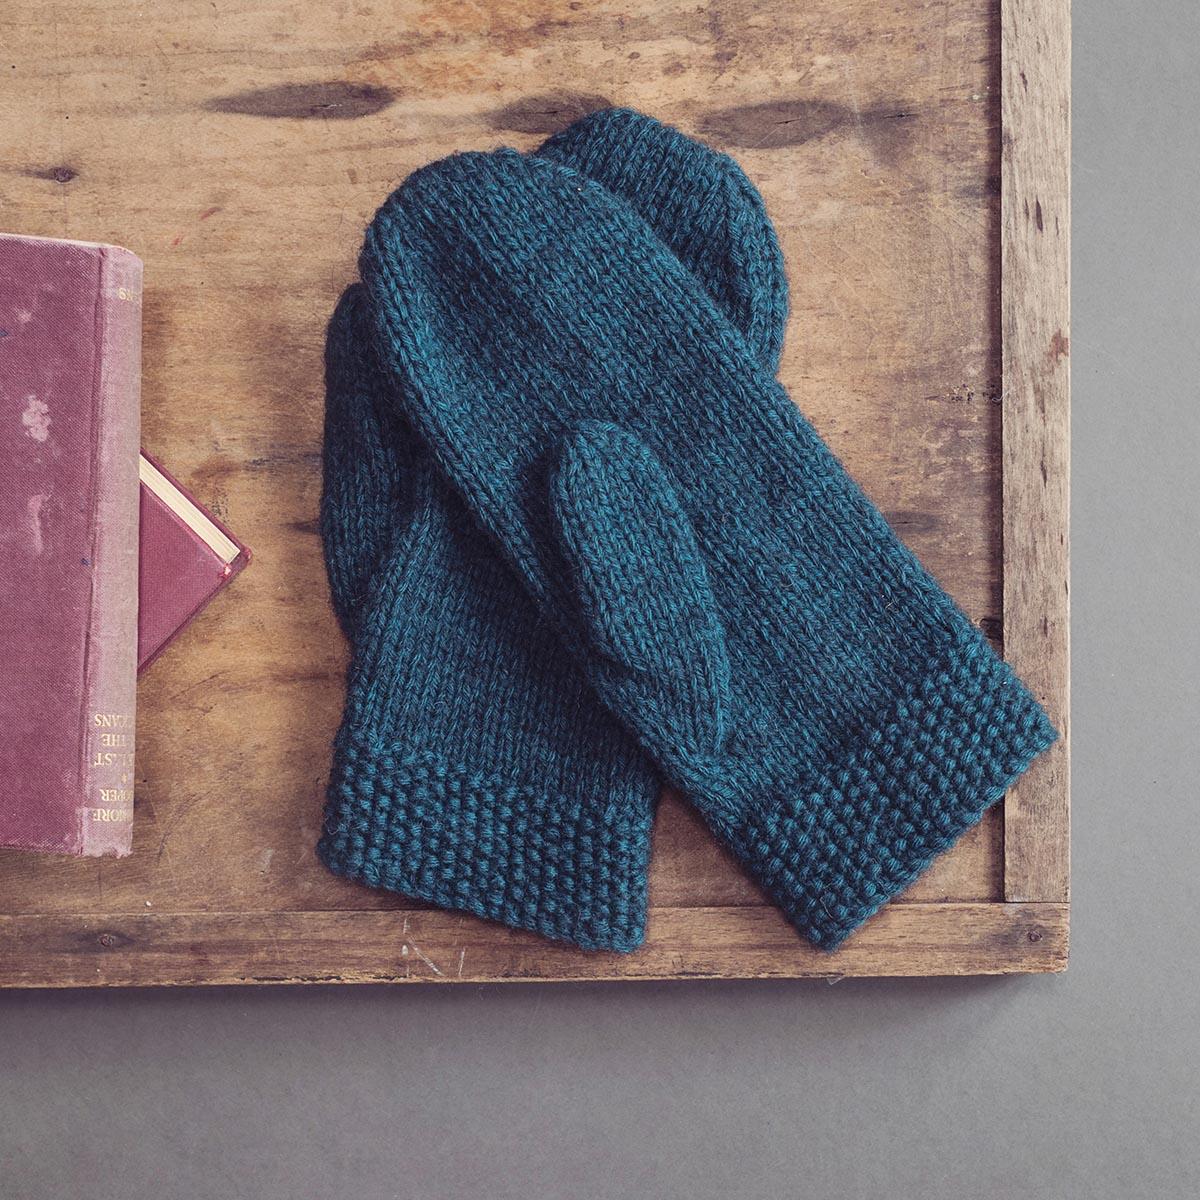 Downloadable - Warm Ladies Mittens, Knitting Pattern ...